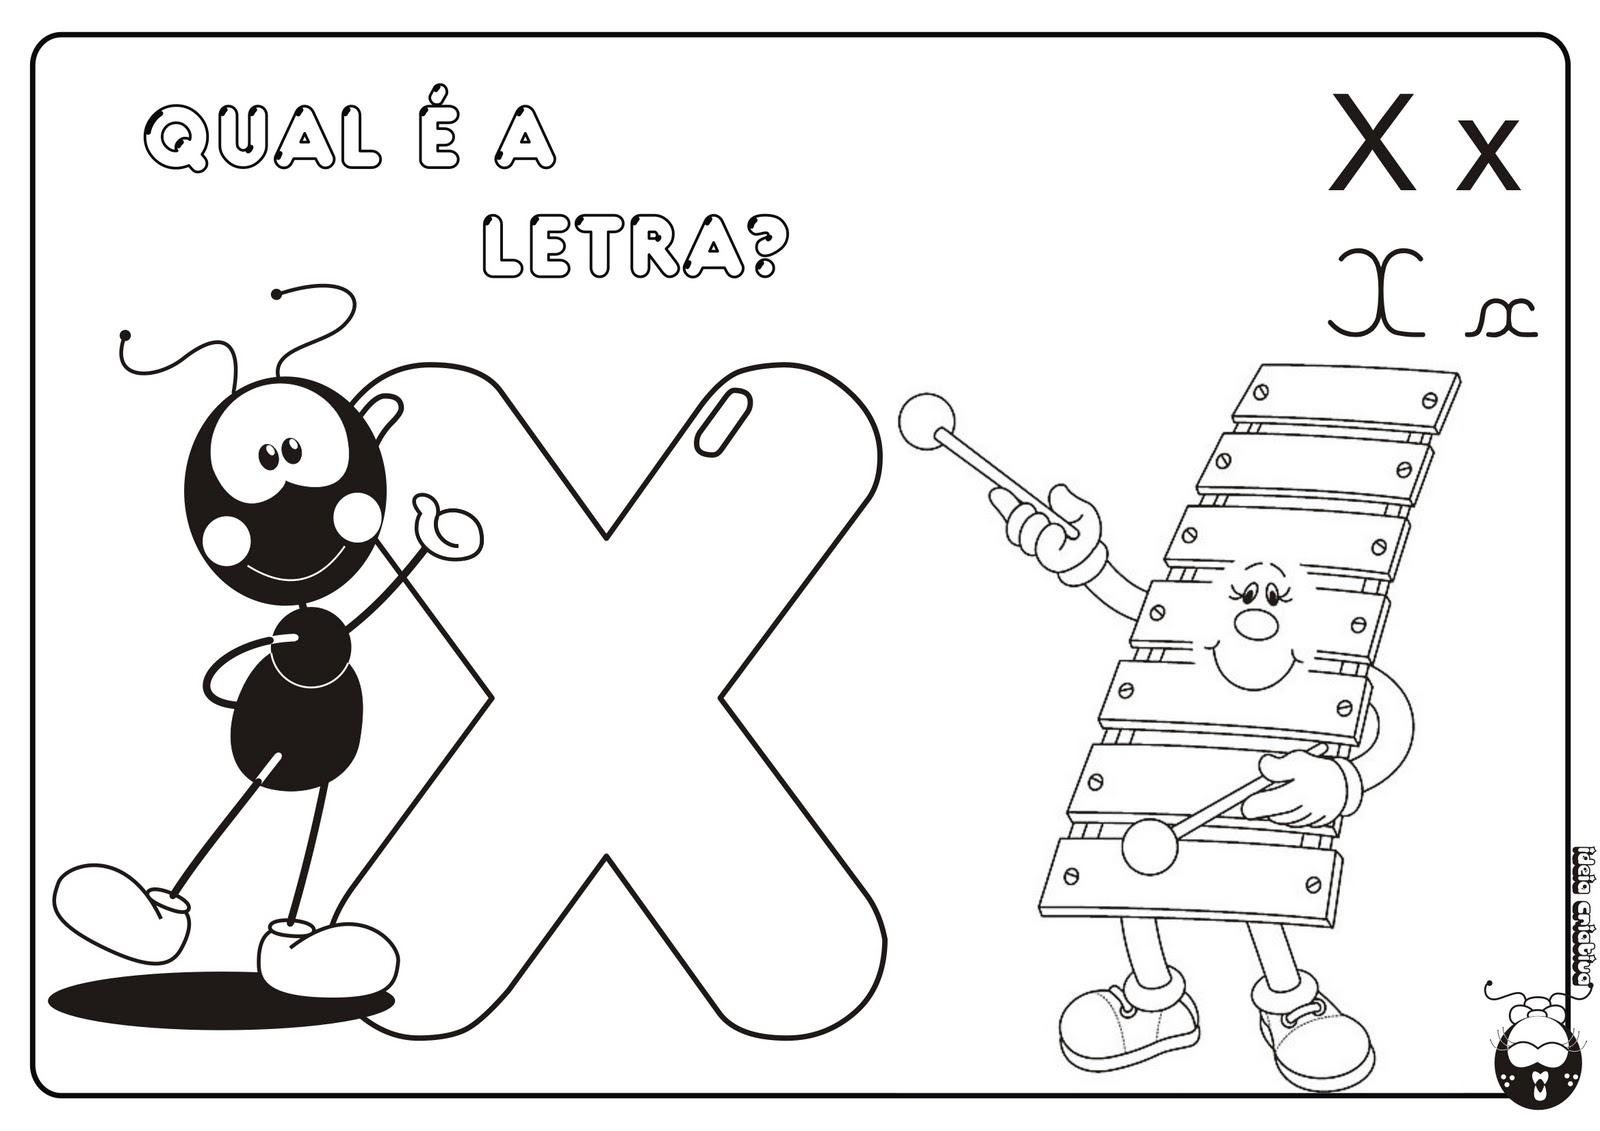 Alfabeto Smilinguido 4 tipos de letra para Baixar Grátis Letra x